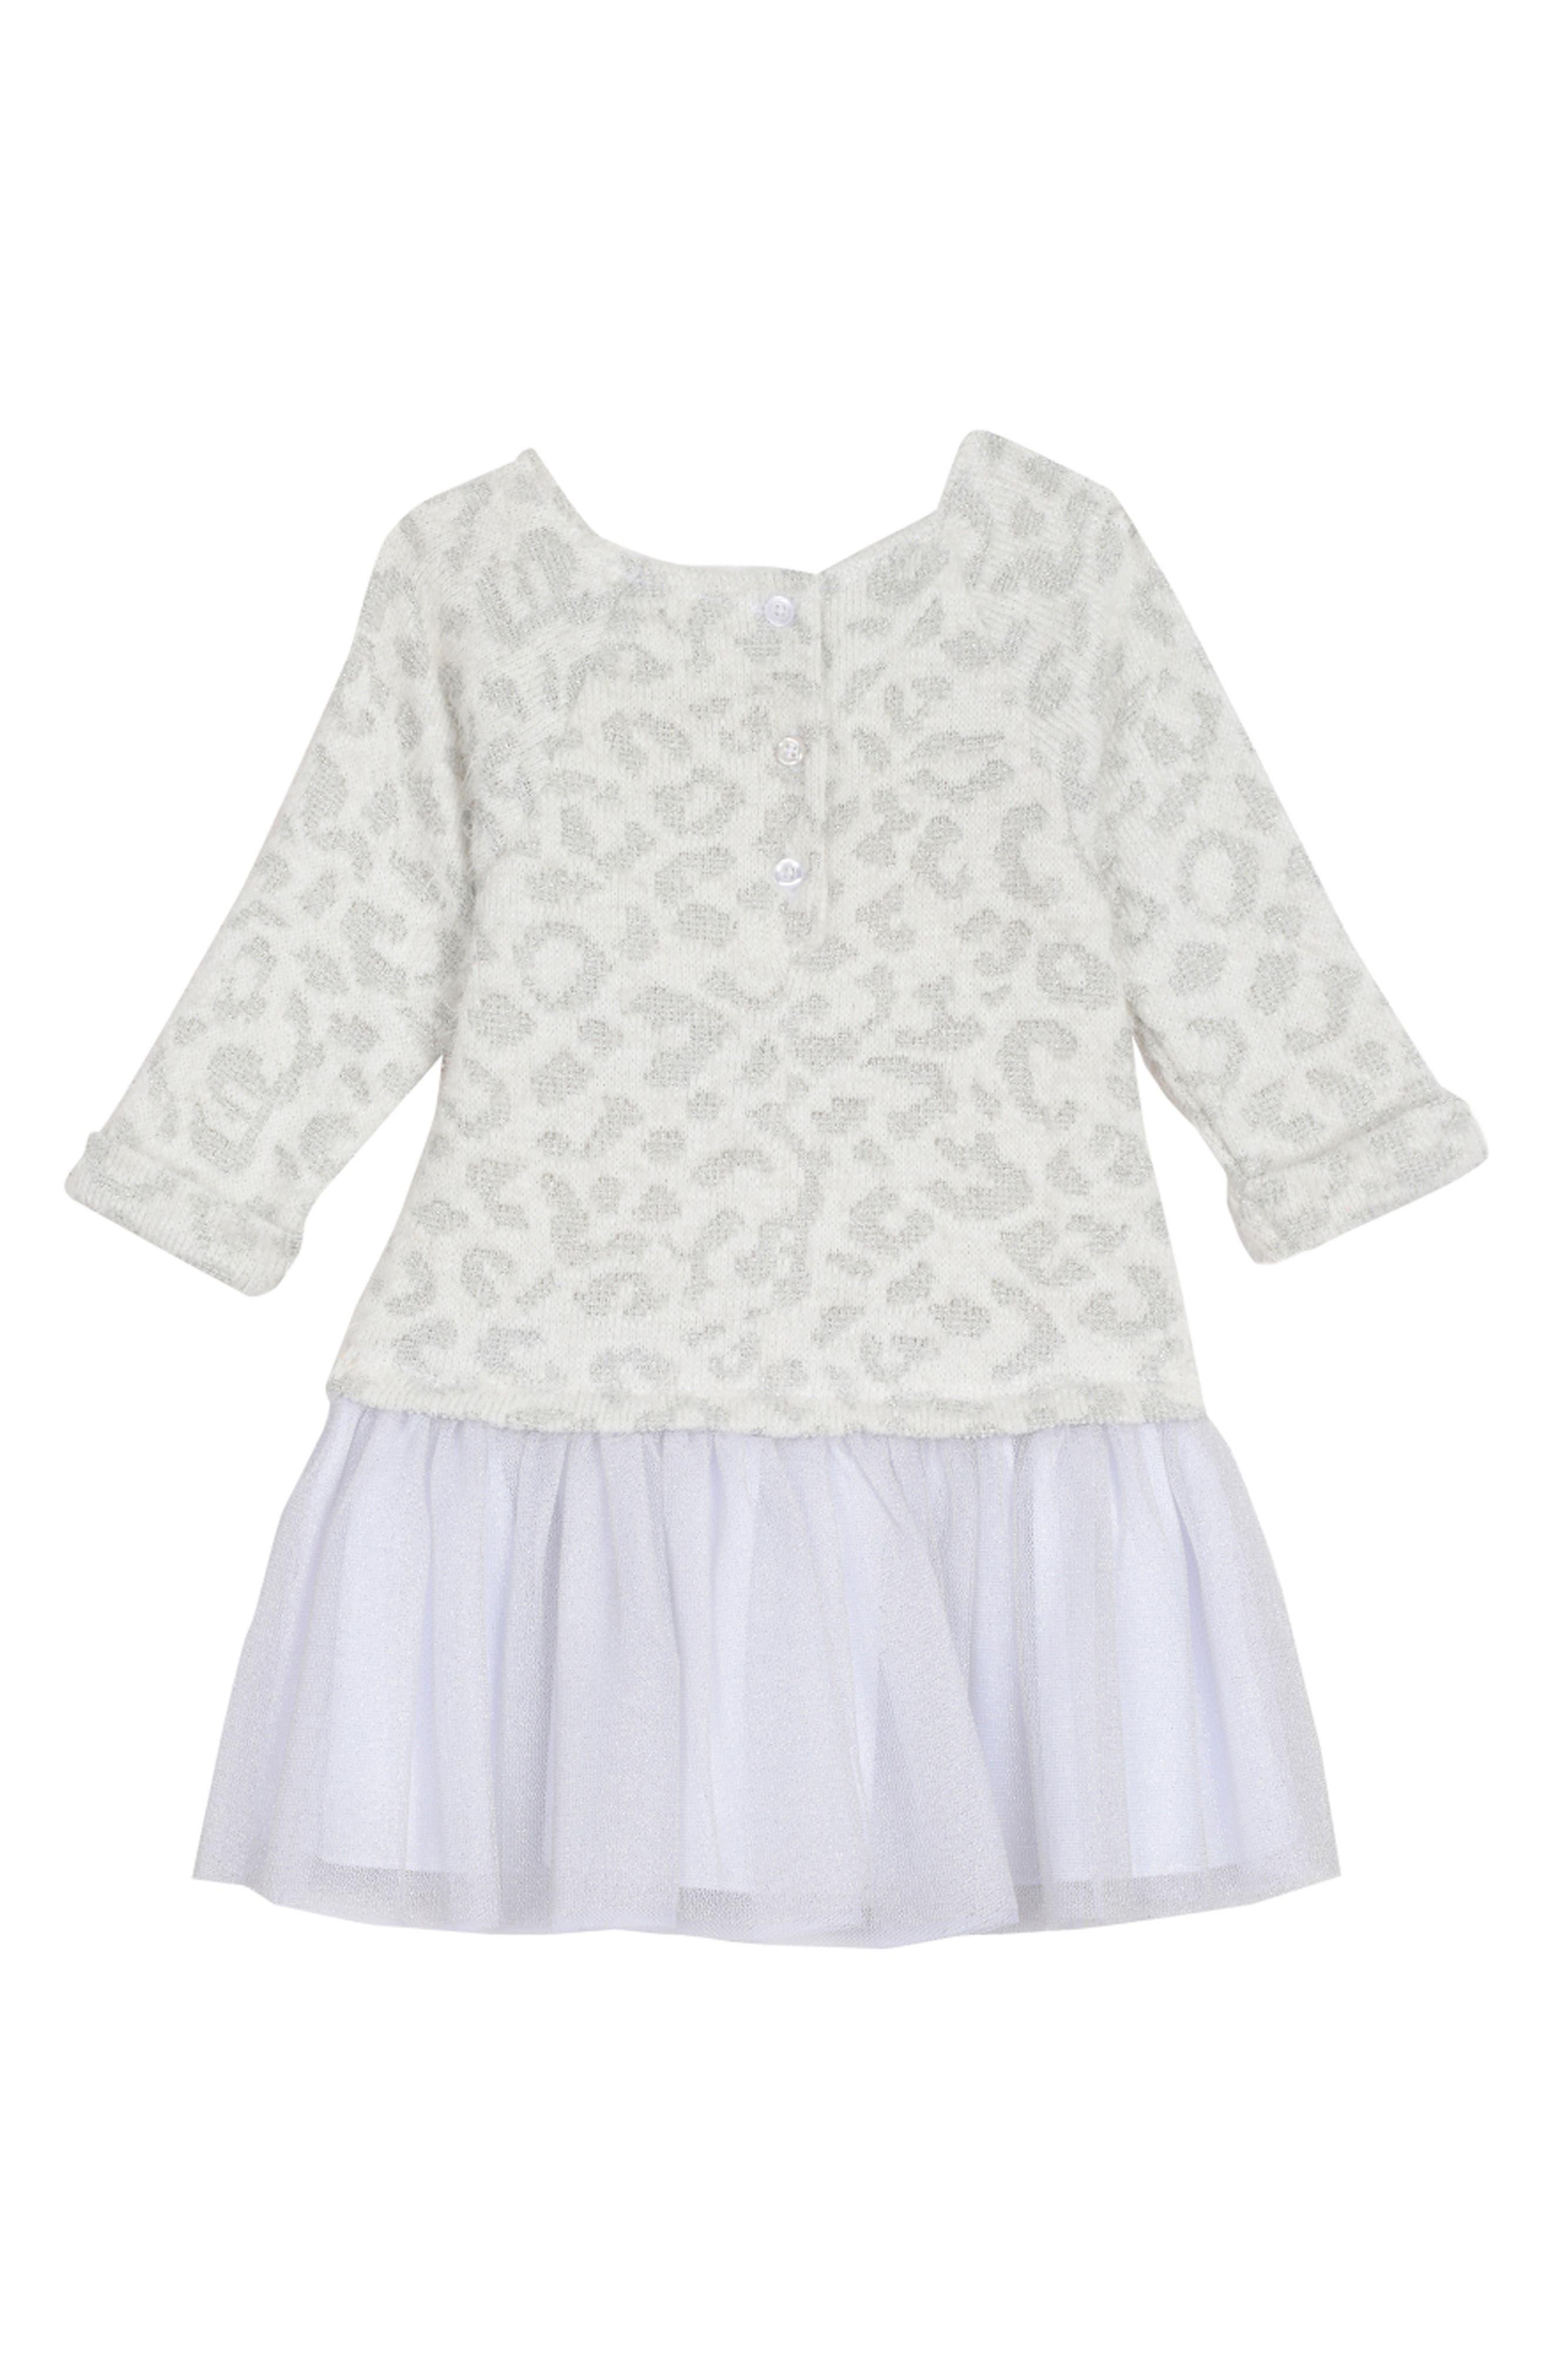 PIPPA & JULIE, Animal Pattern Sweater Dress, Alternate thumbnail 2, color, WHITE/ SILVER